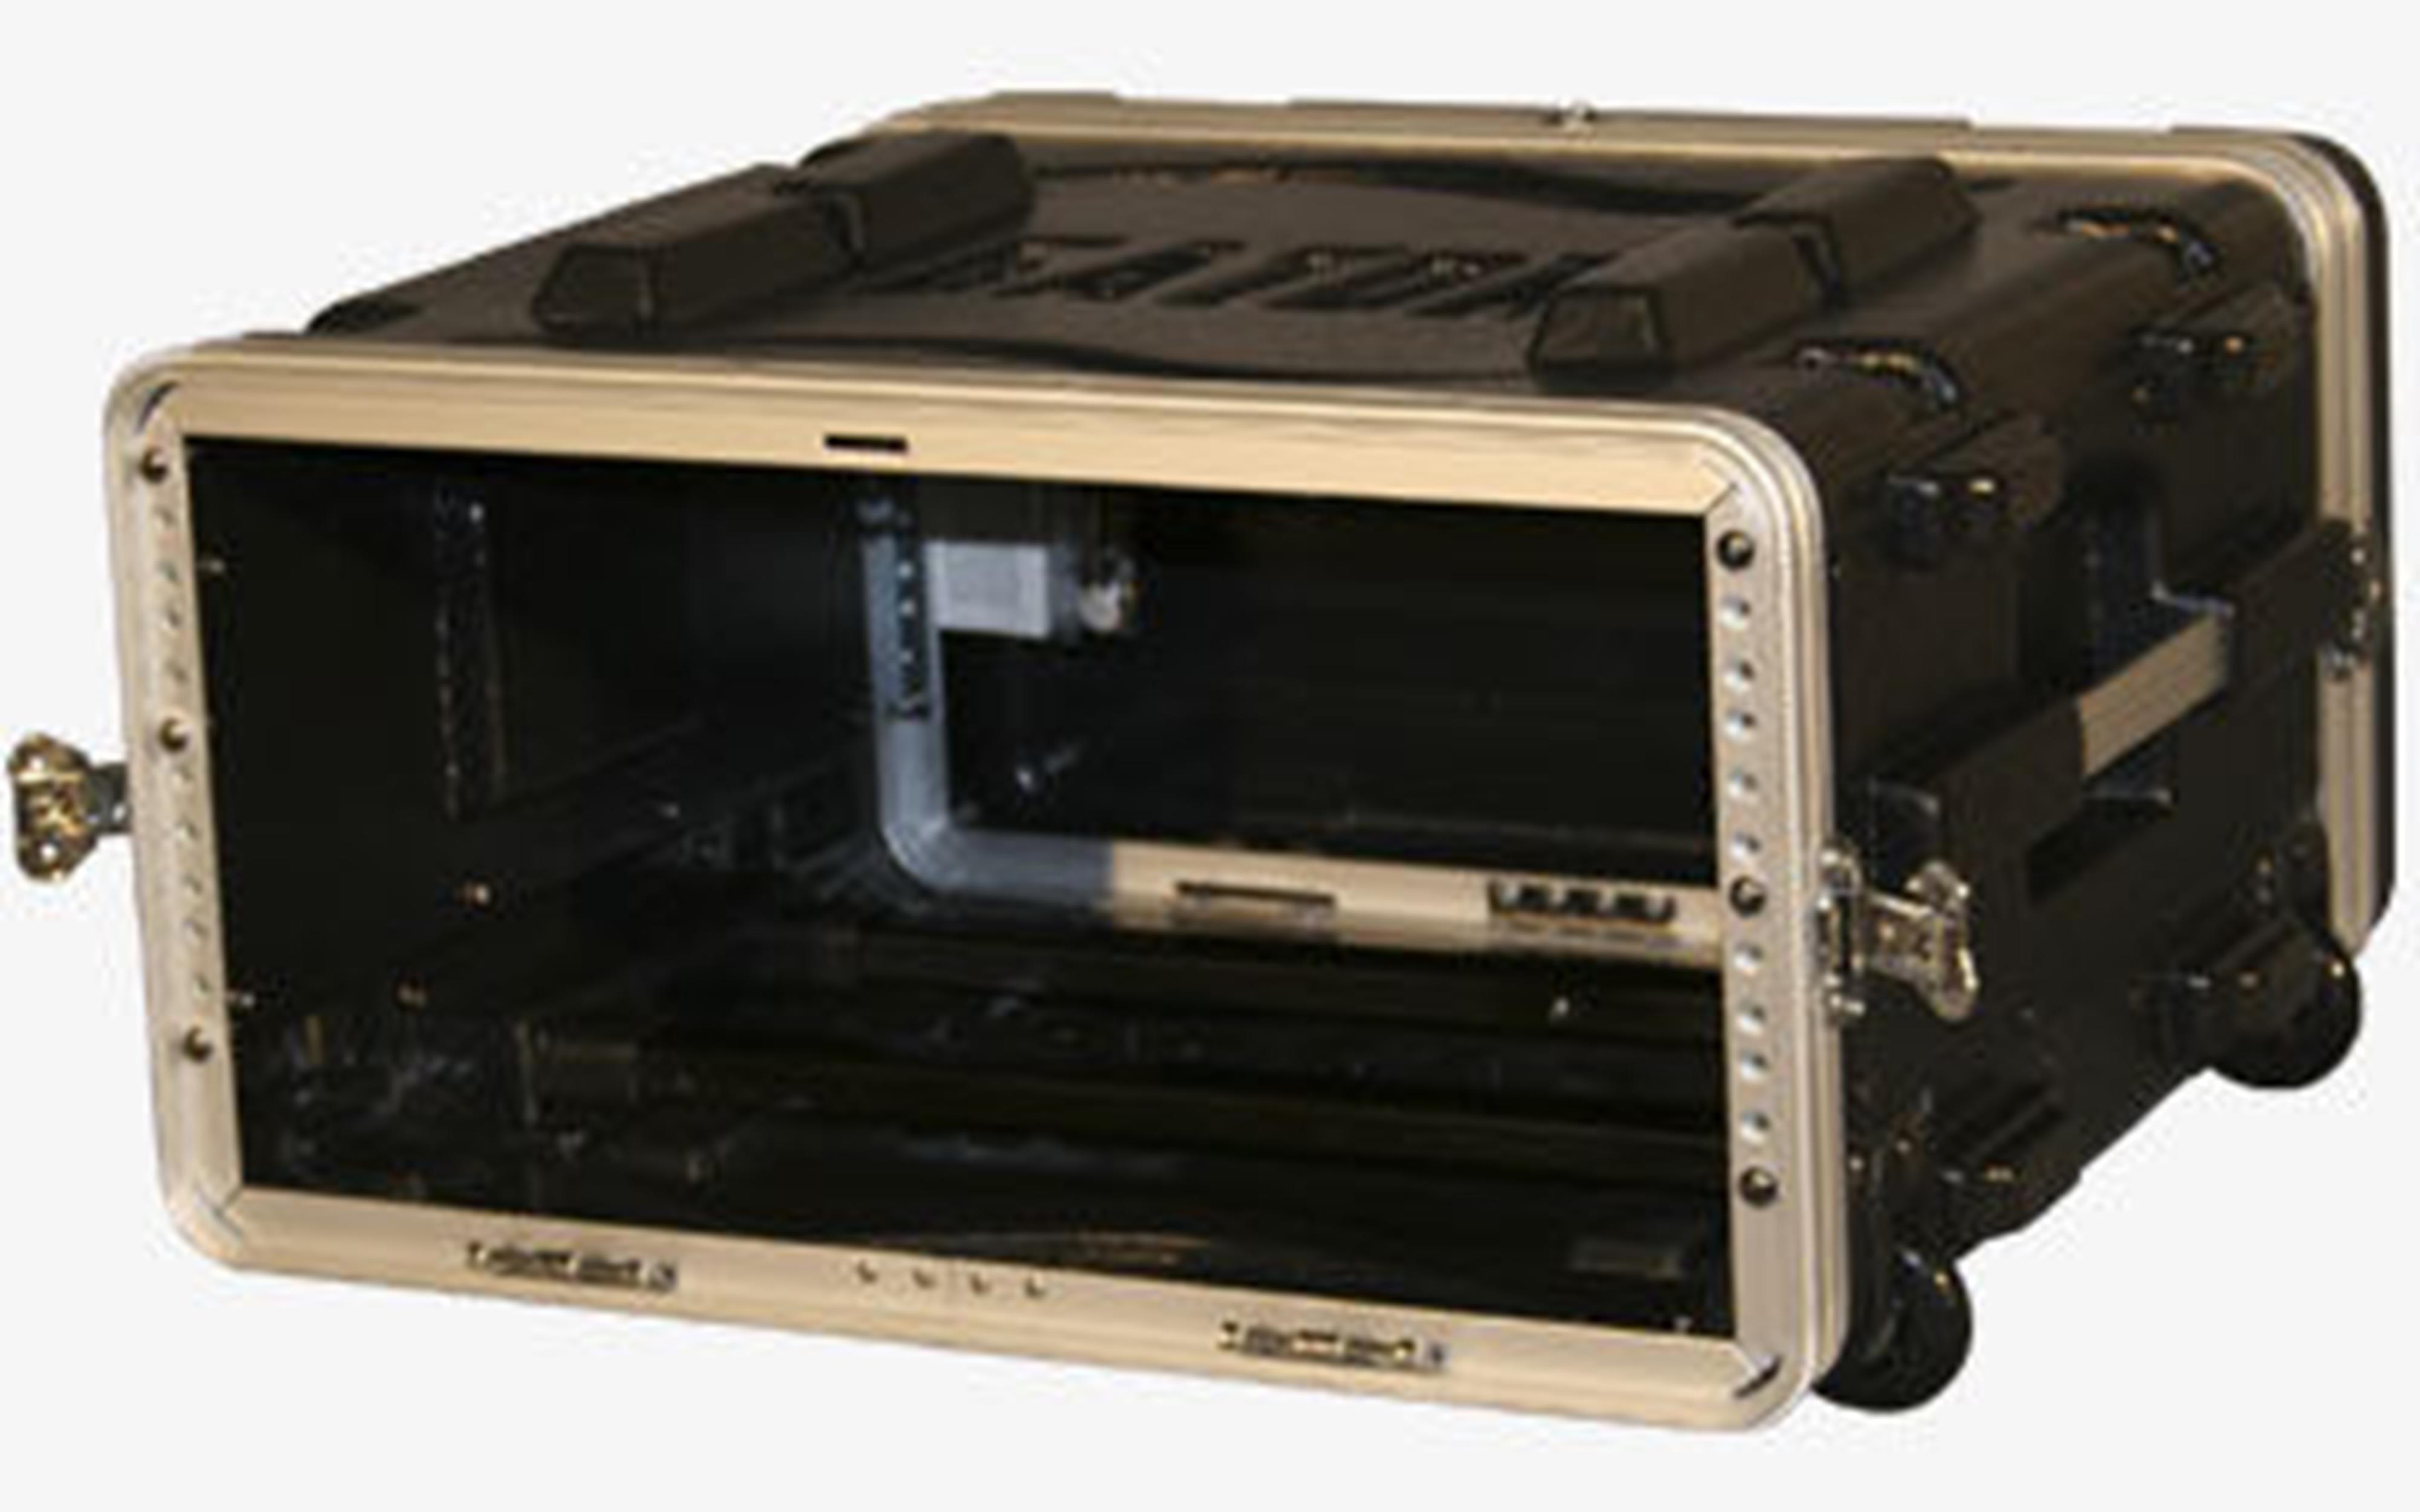 Gator-Cases-GRR-4L-rolling-rack-da-4U-profondit-19-sku-2776759415011